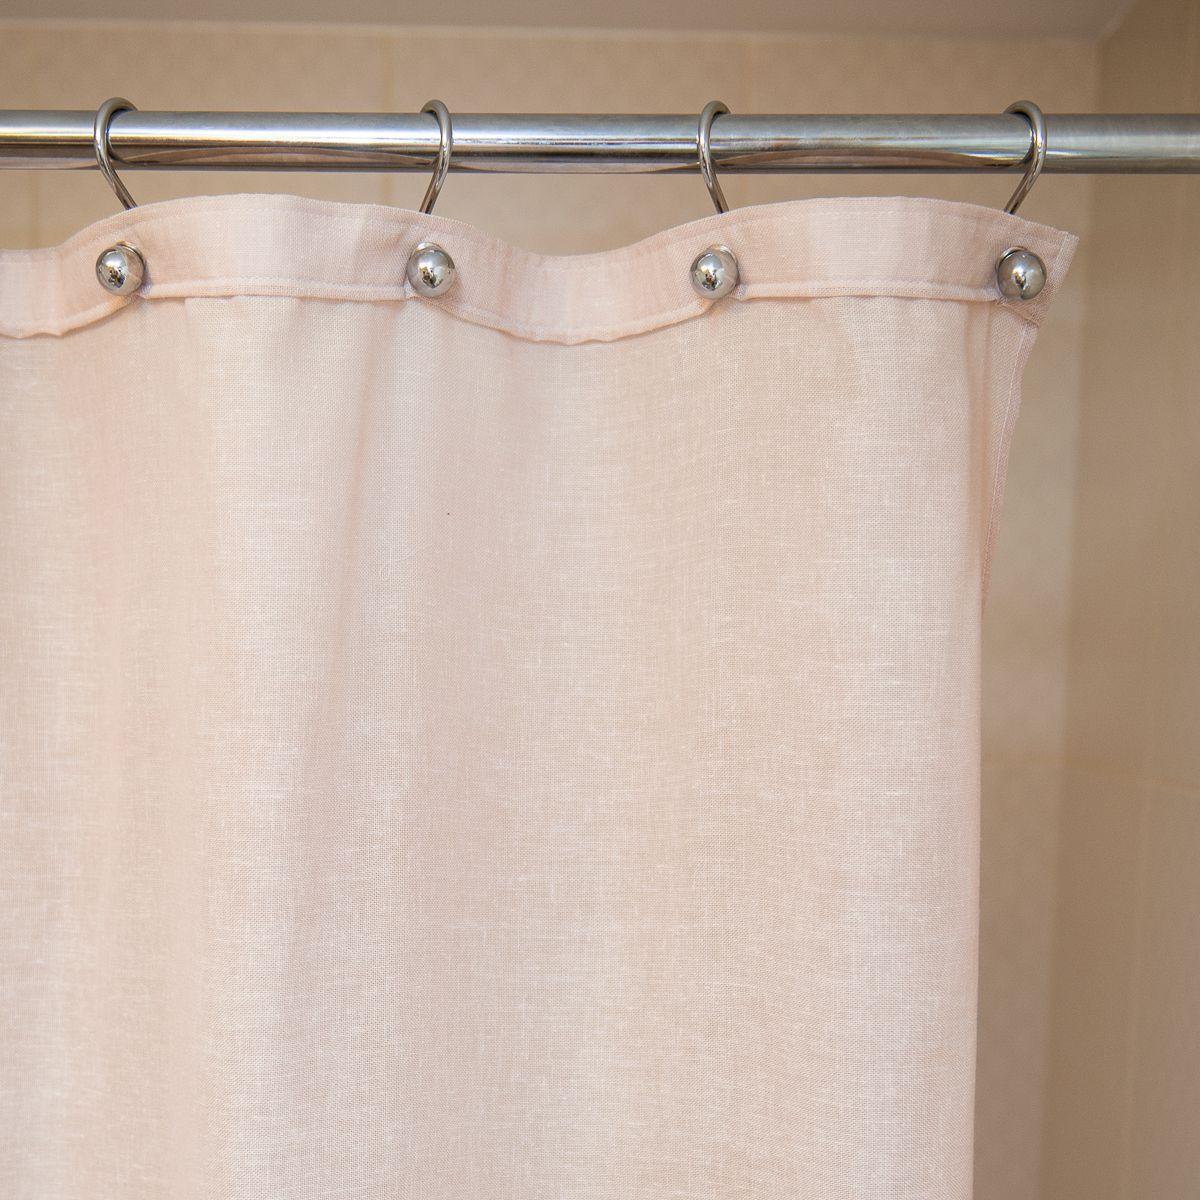 Шторки Элитная шторка для ванной Osaka C-3 от Arti-Deco elitnaya-shtorka-dlya-vannoy-osaka-c-3-ot-arti-deco-ispaniya_.jpg